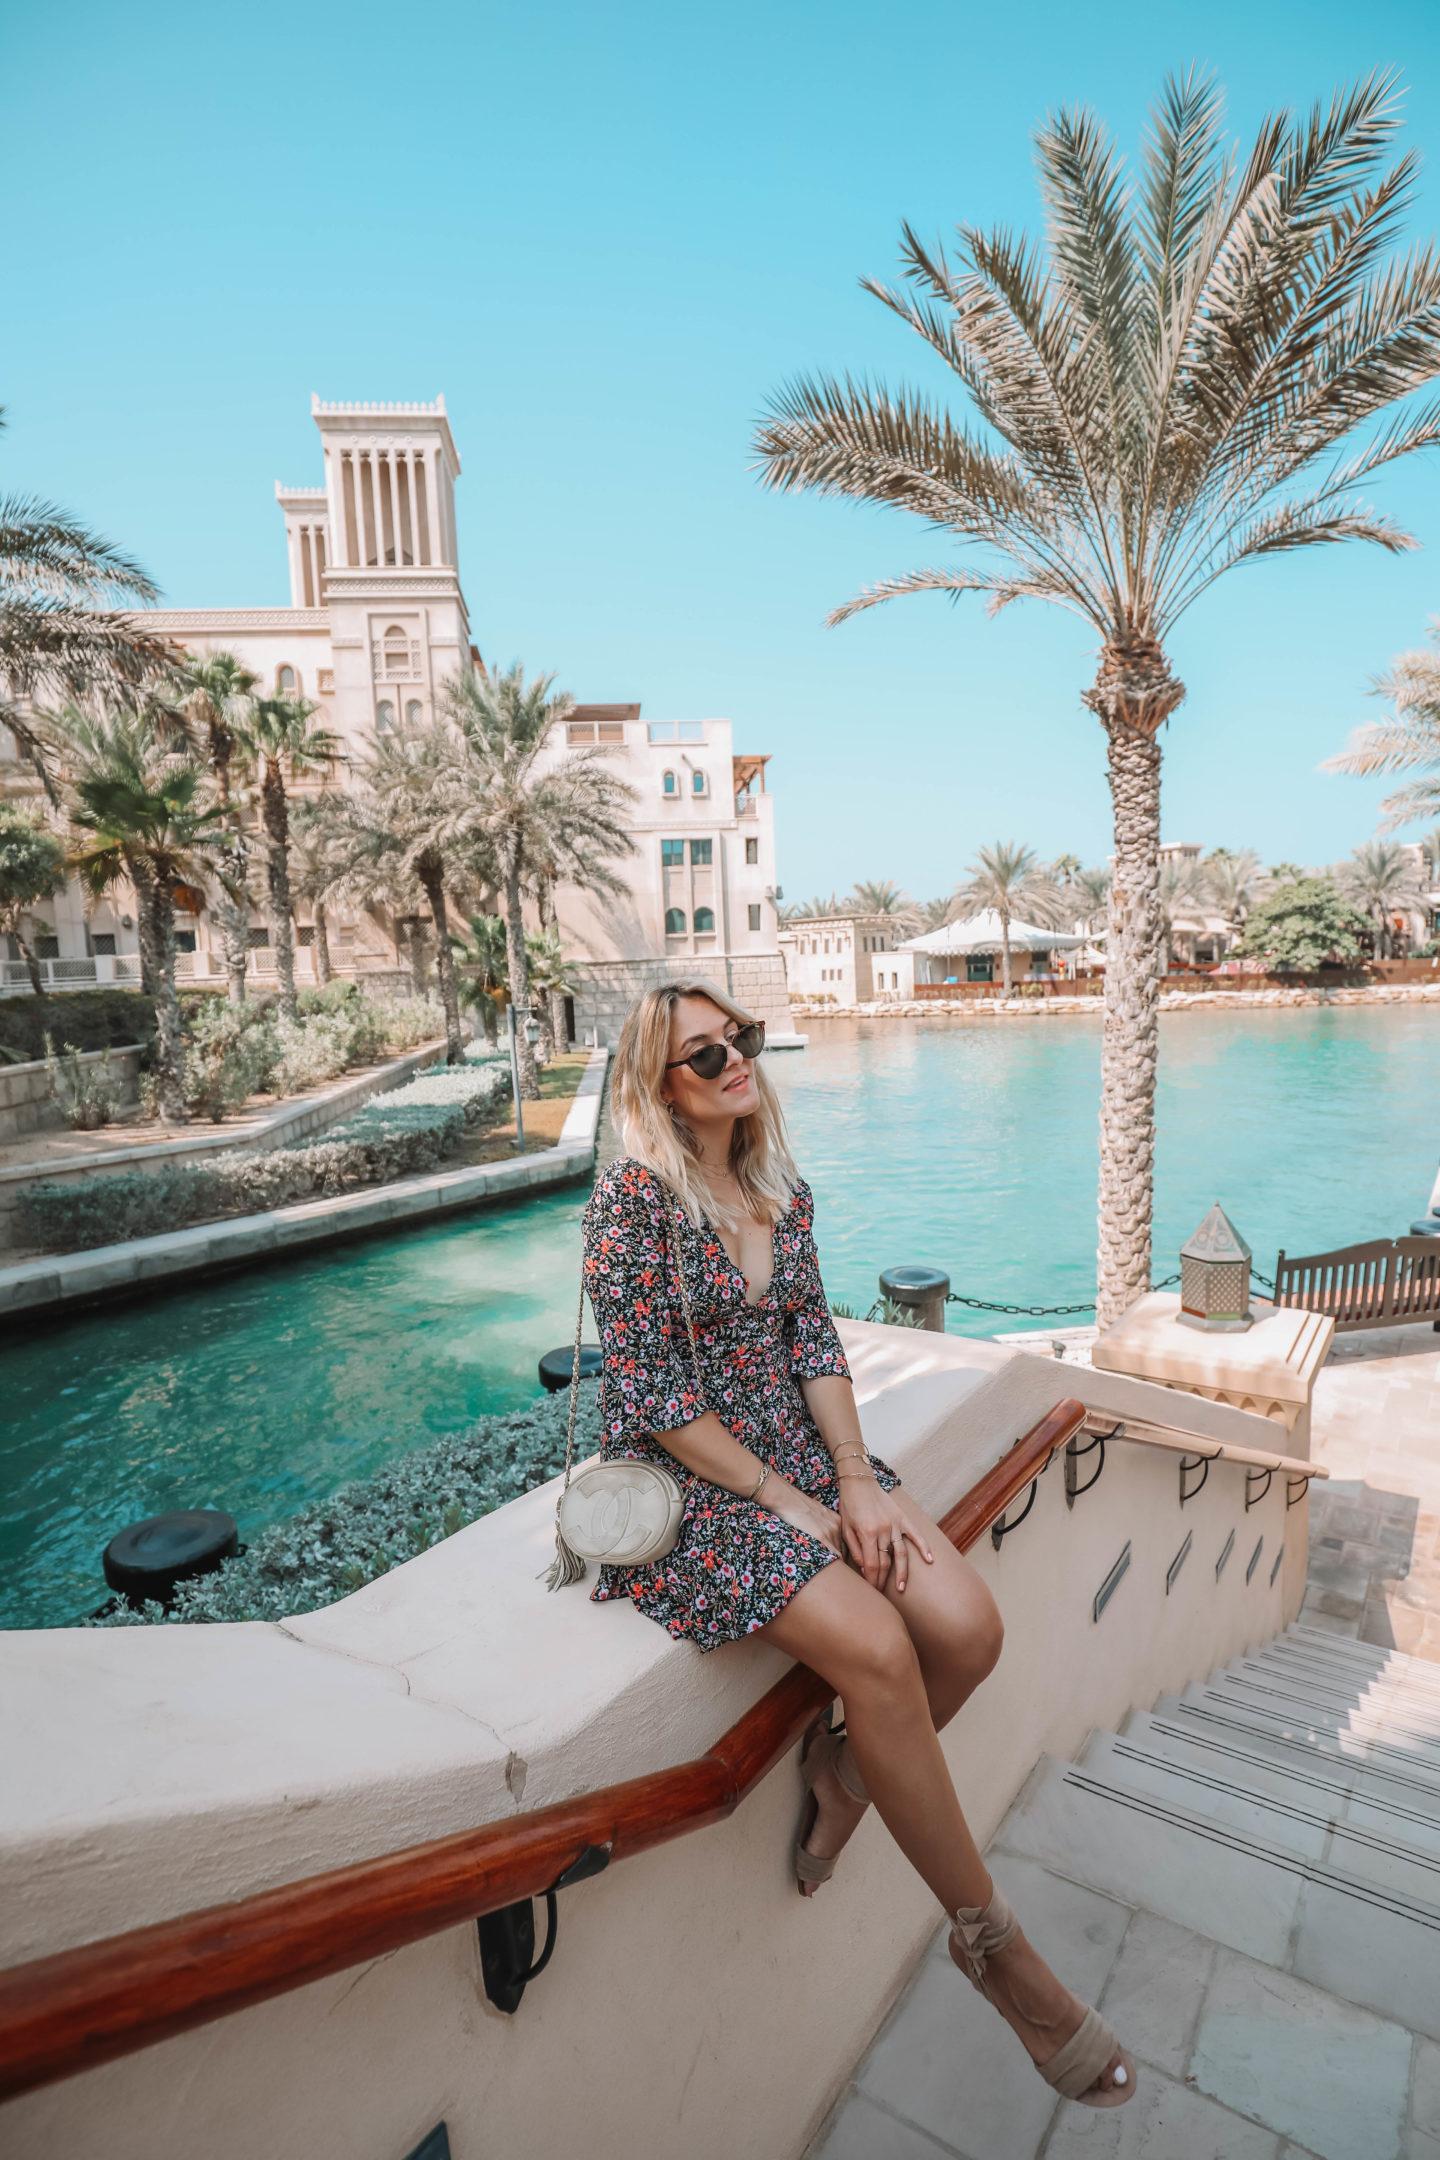 Jumeirah Dubaï - Blondie Baby blog mode et voyages